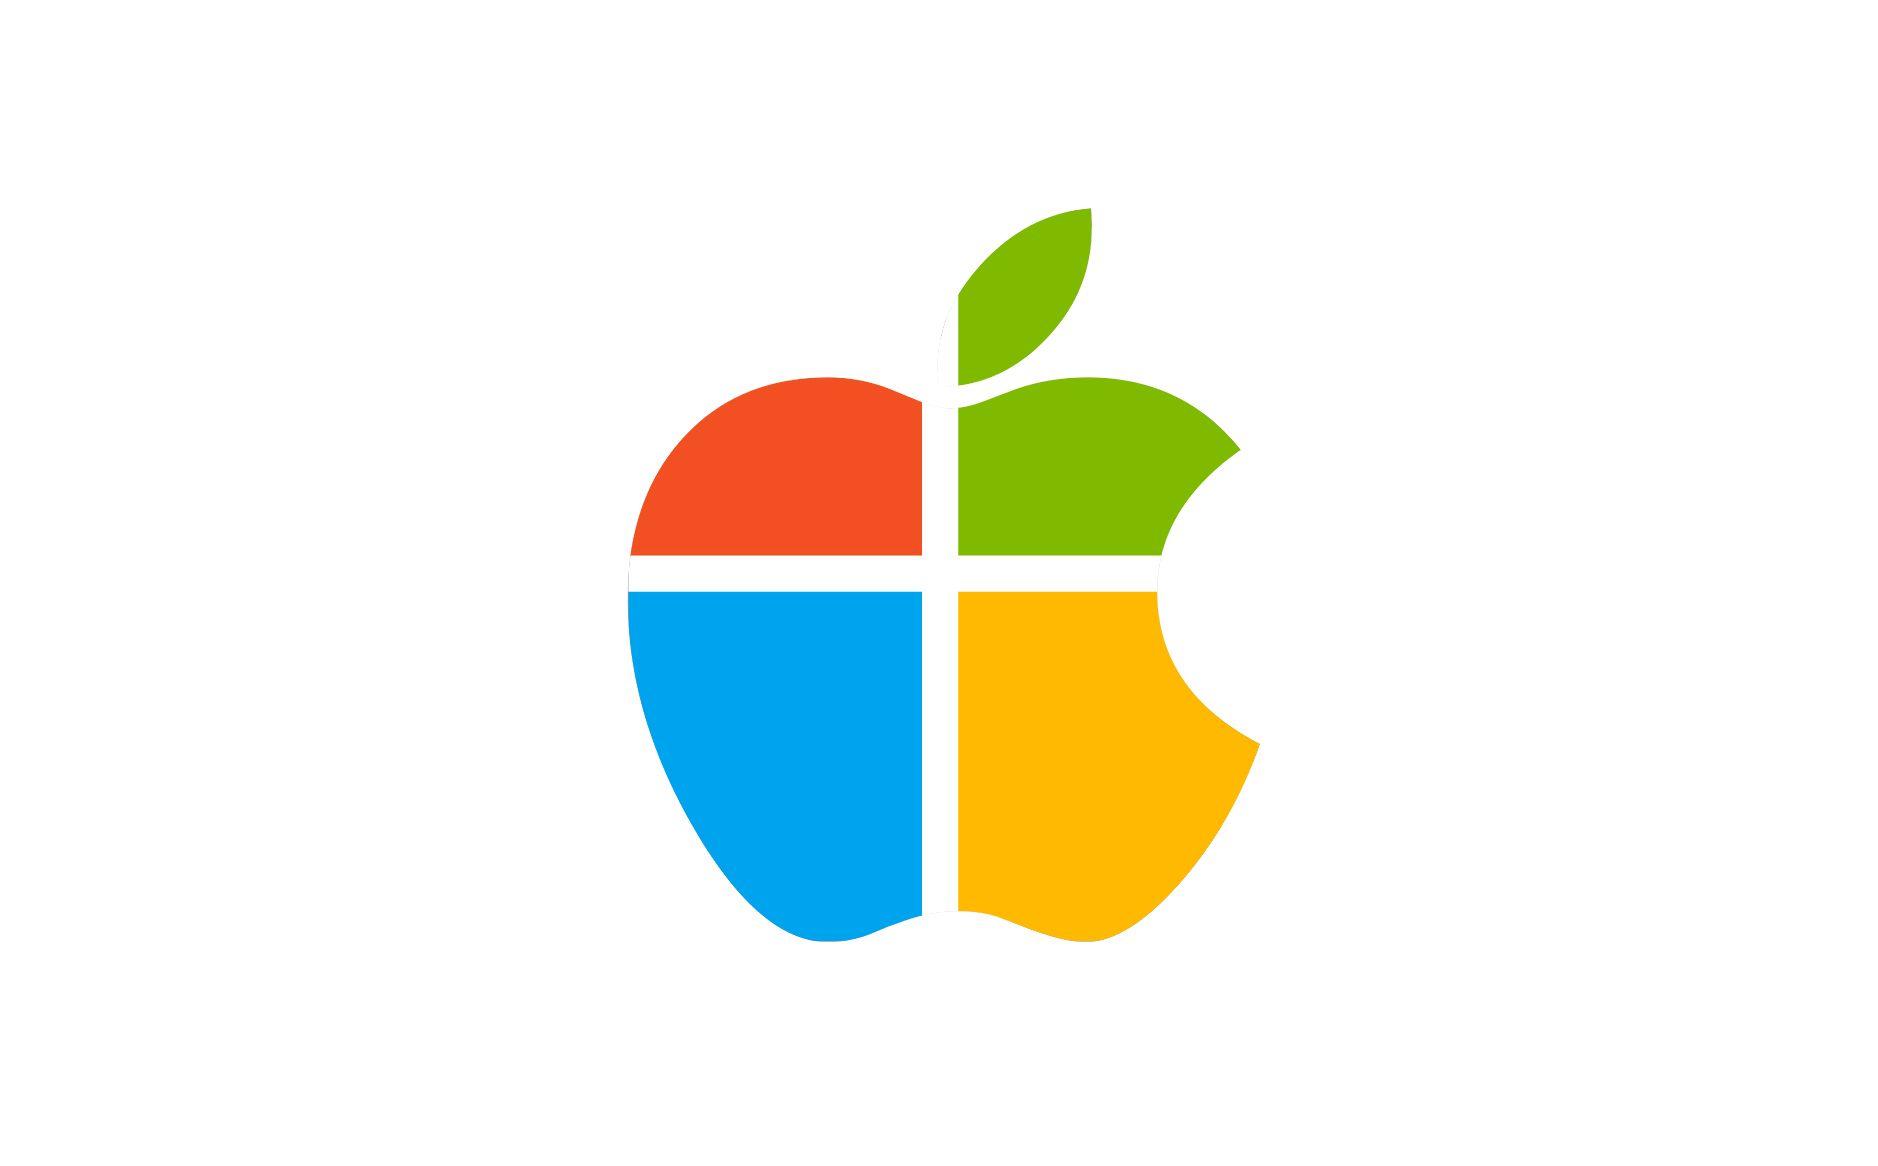 Microsoft Apple